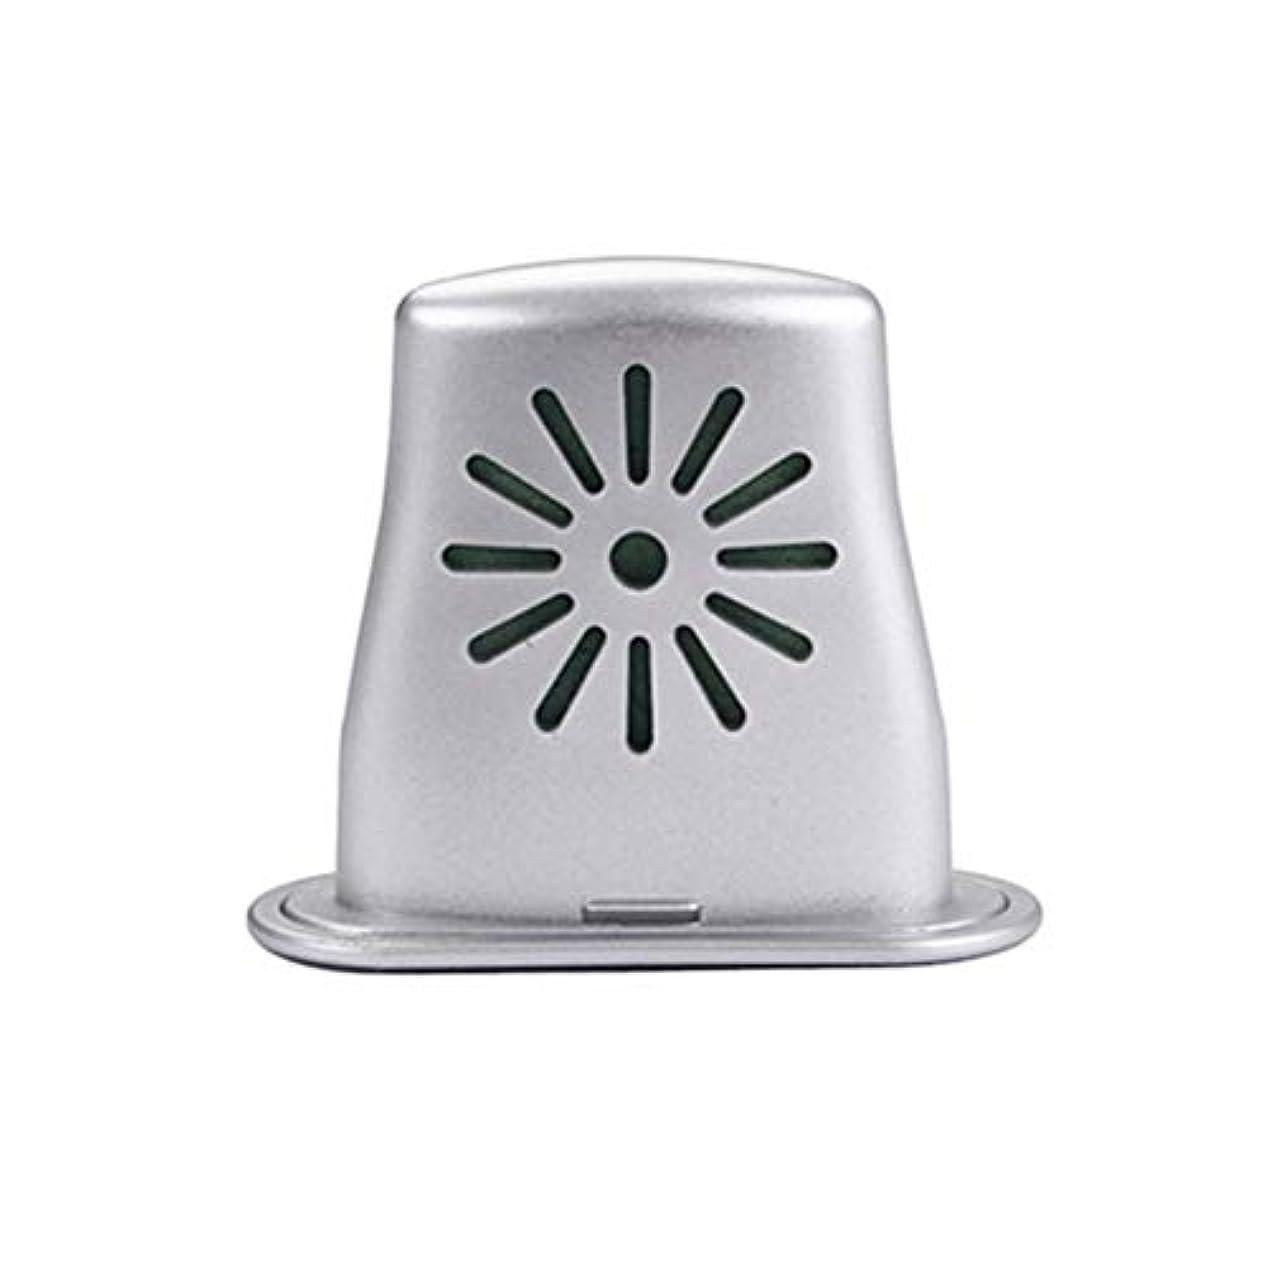 Healifty VZ02 Ukelele加湿器ウクレレアクセサリー用ウクレレ防風装置(シルバー)